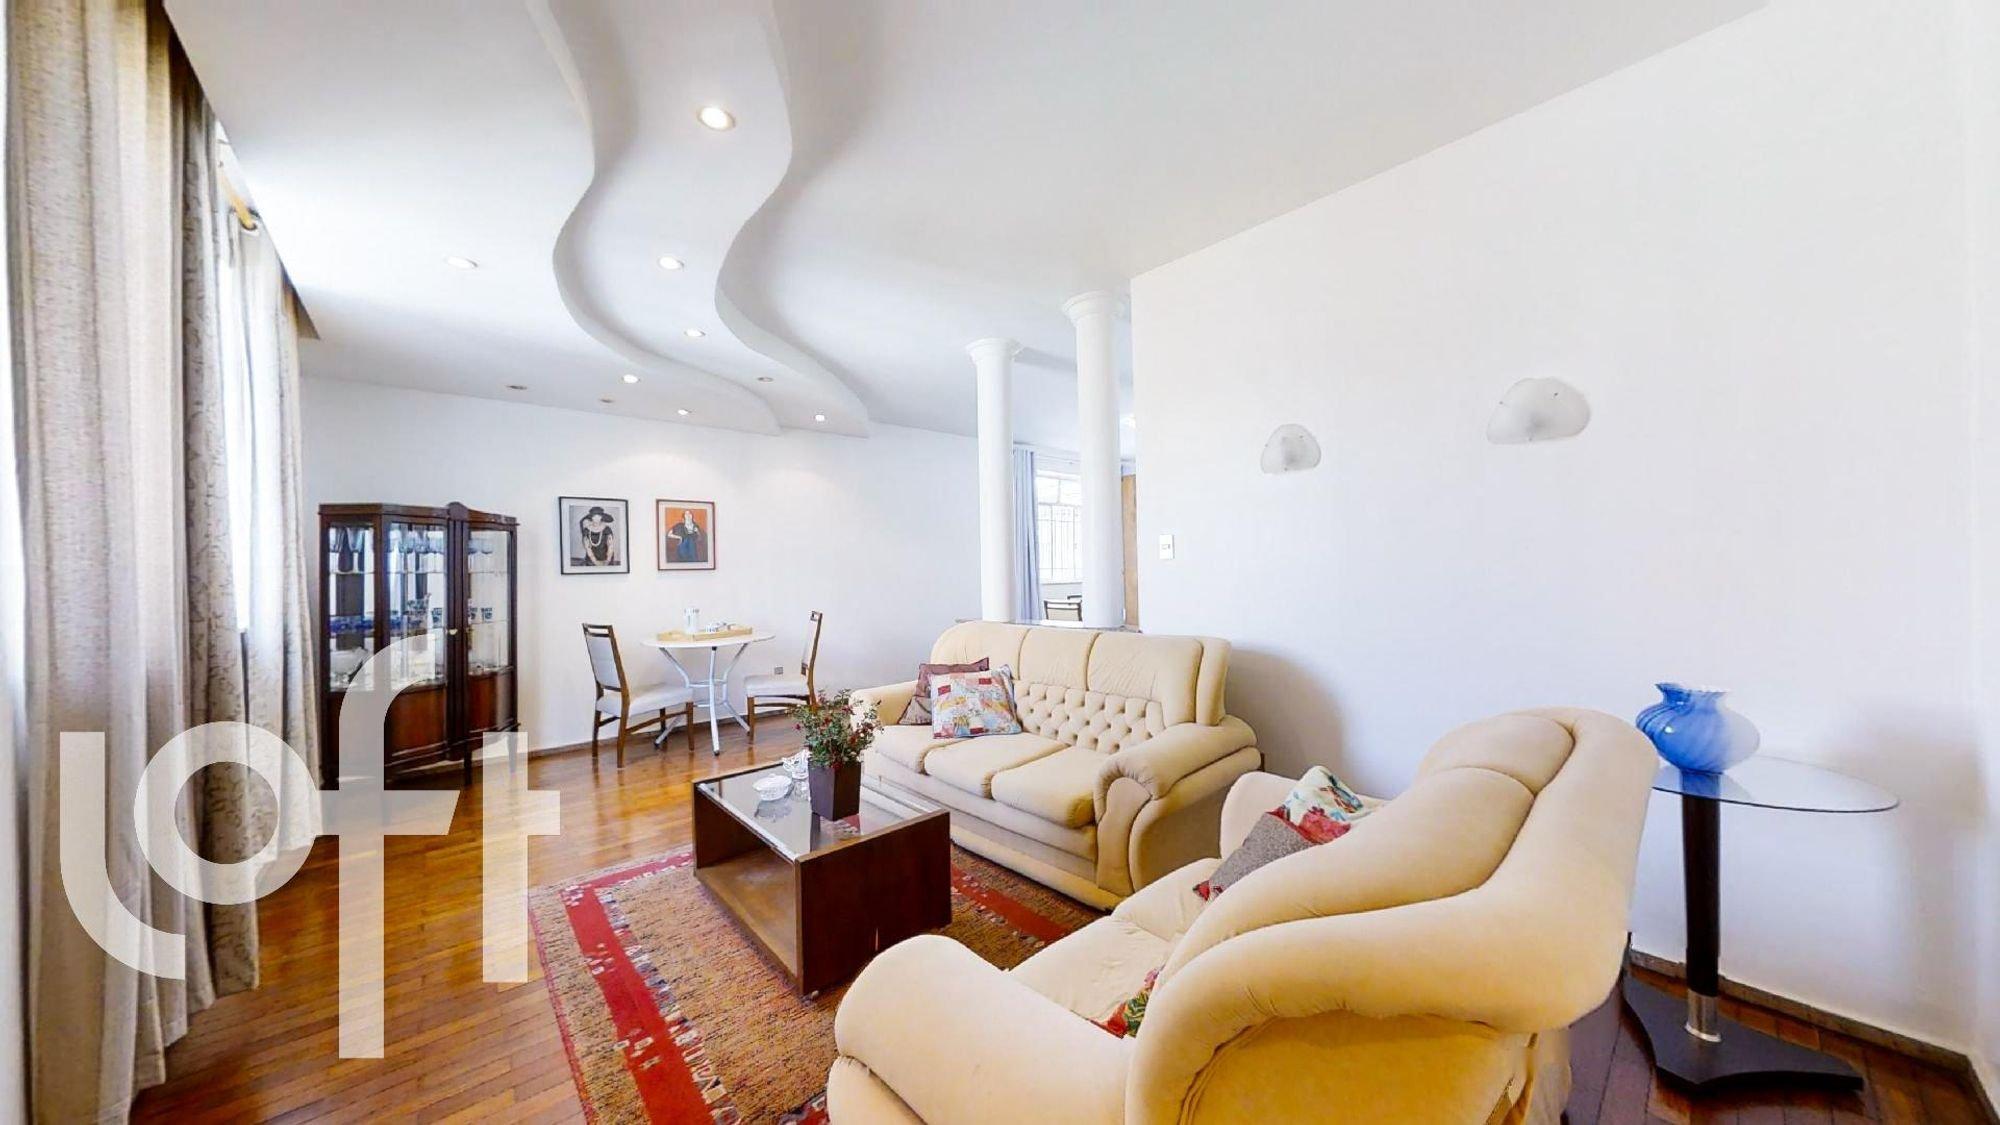 Foto de Sala com vaso de planta, sofá, vaso, cadeira